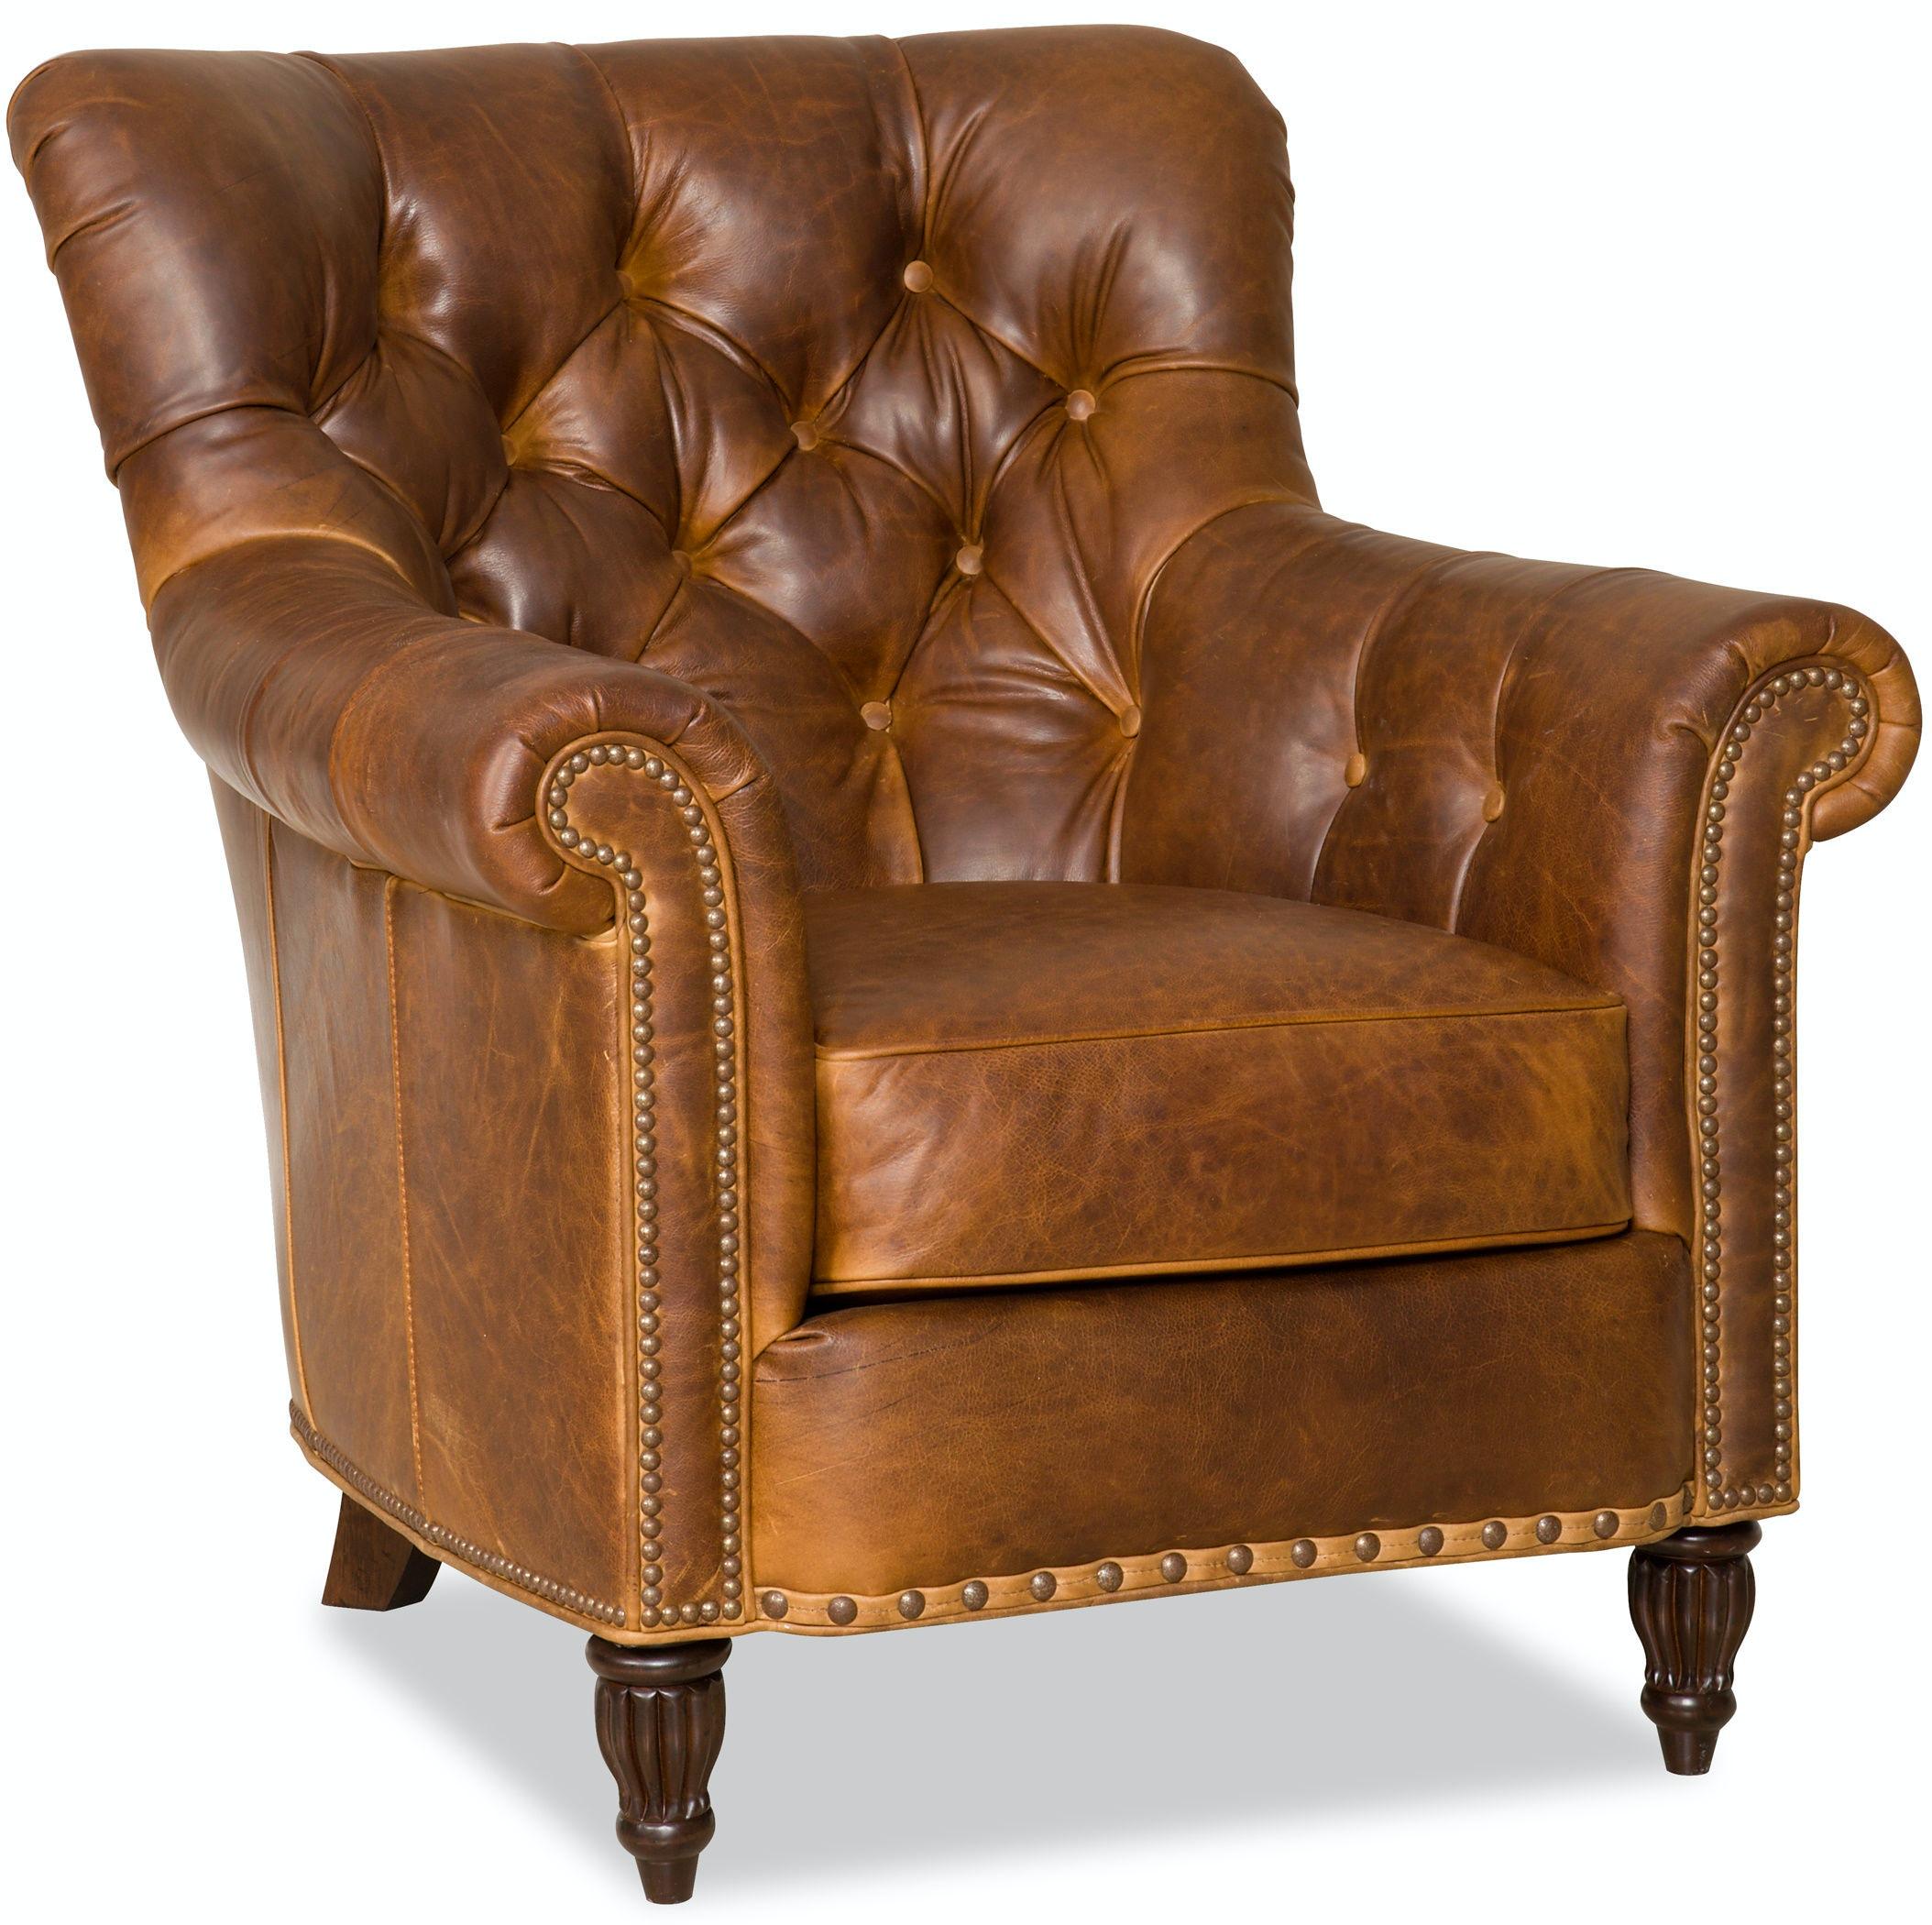 Charmant Bradington Young Kirby Stationary Chair 463 25